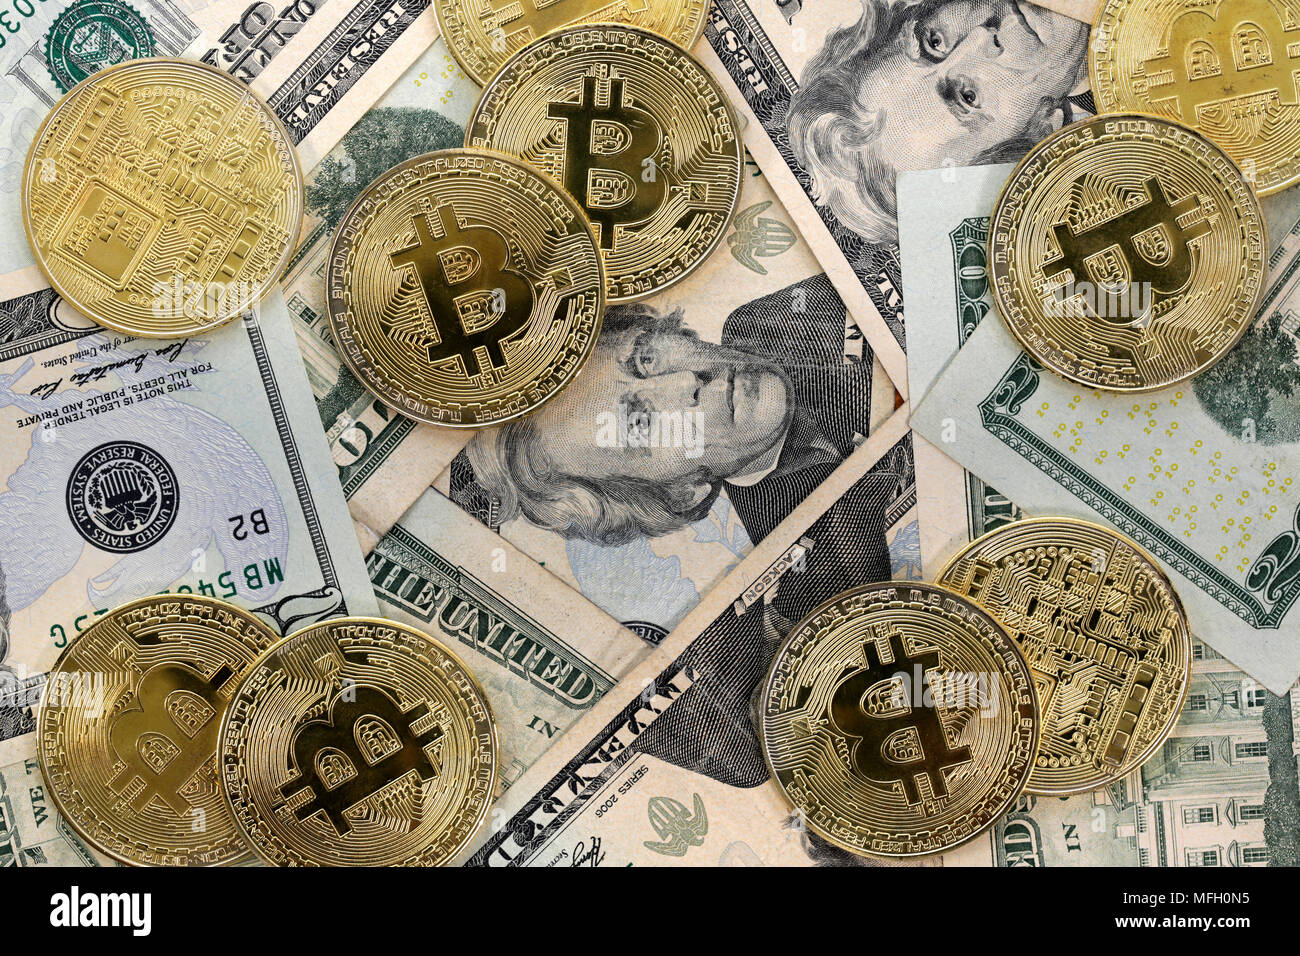 andrew jackson gold dollar coin